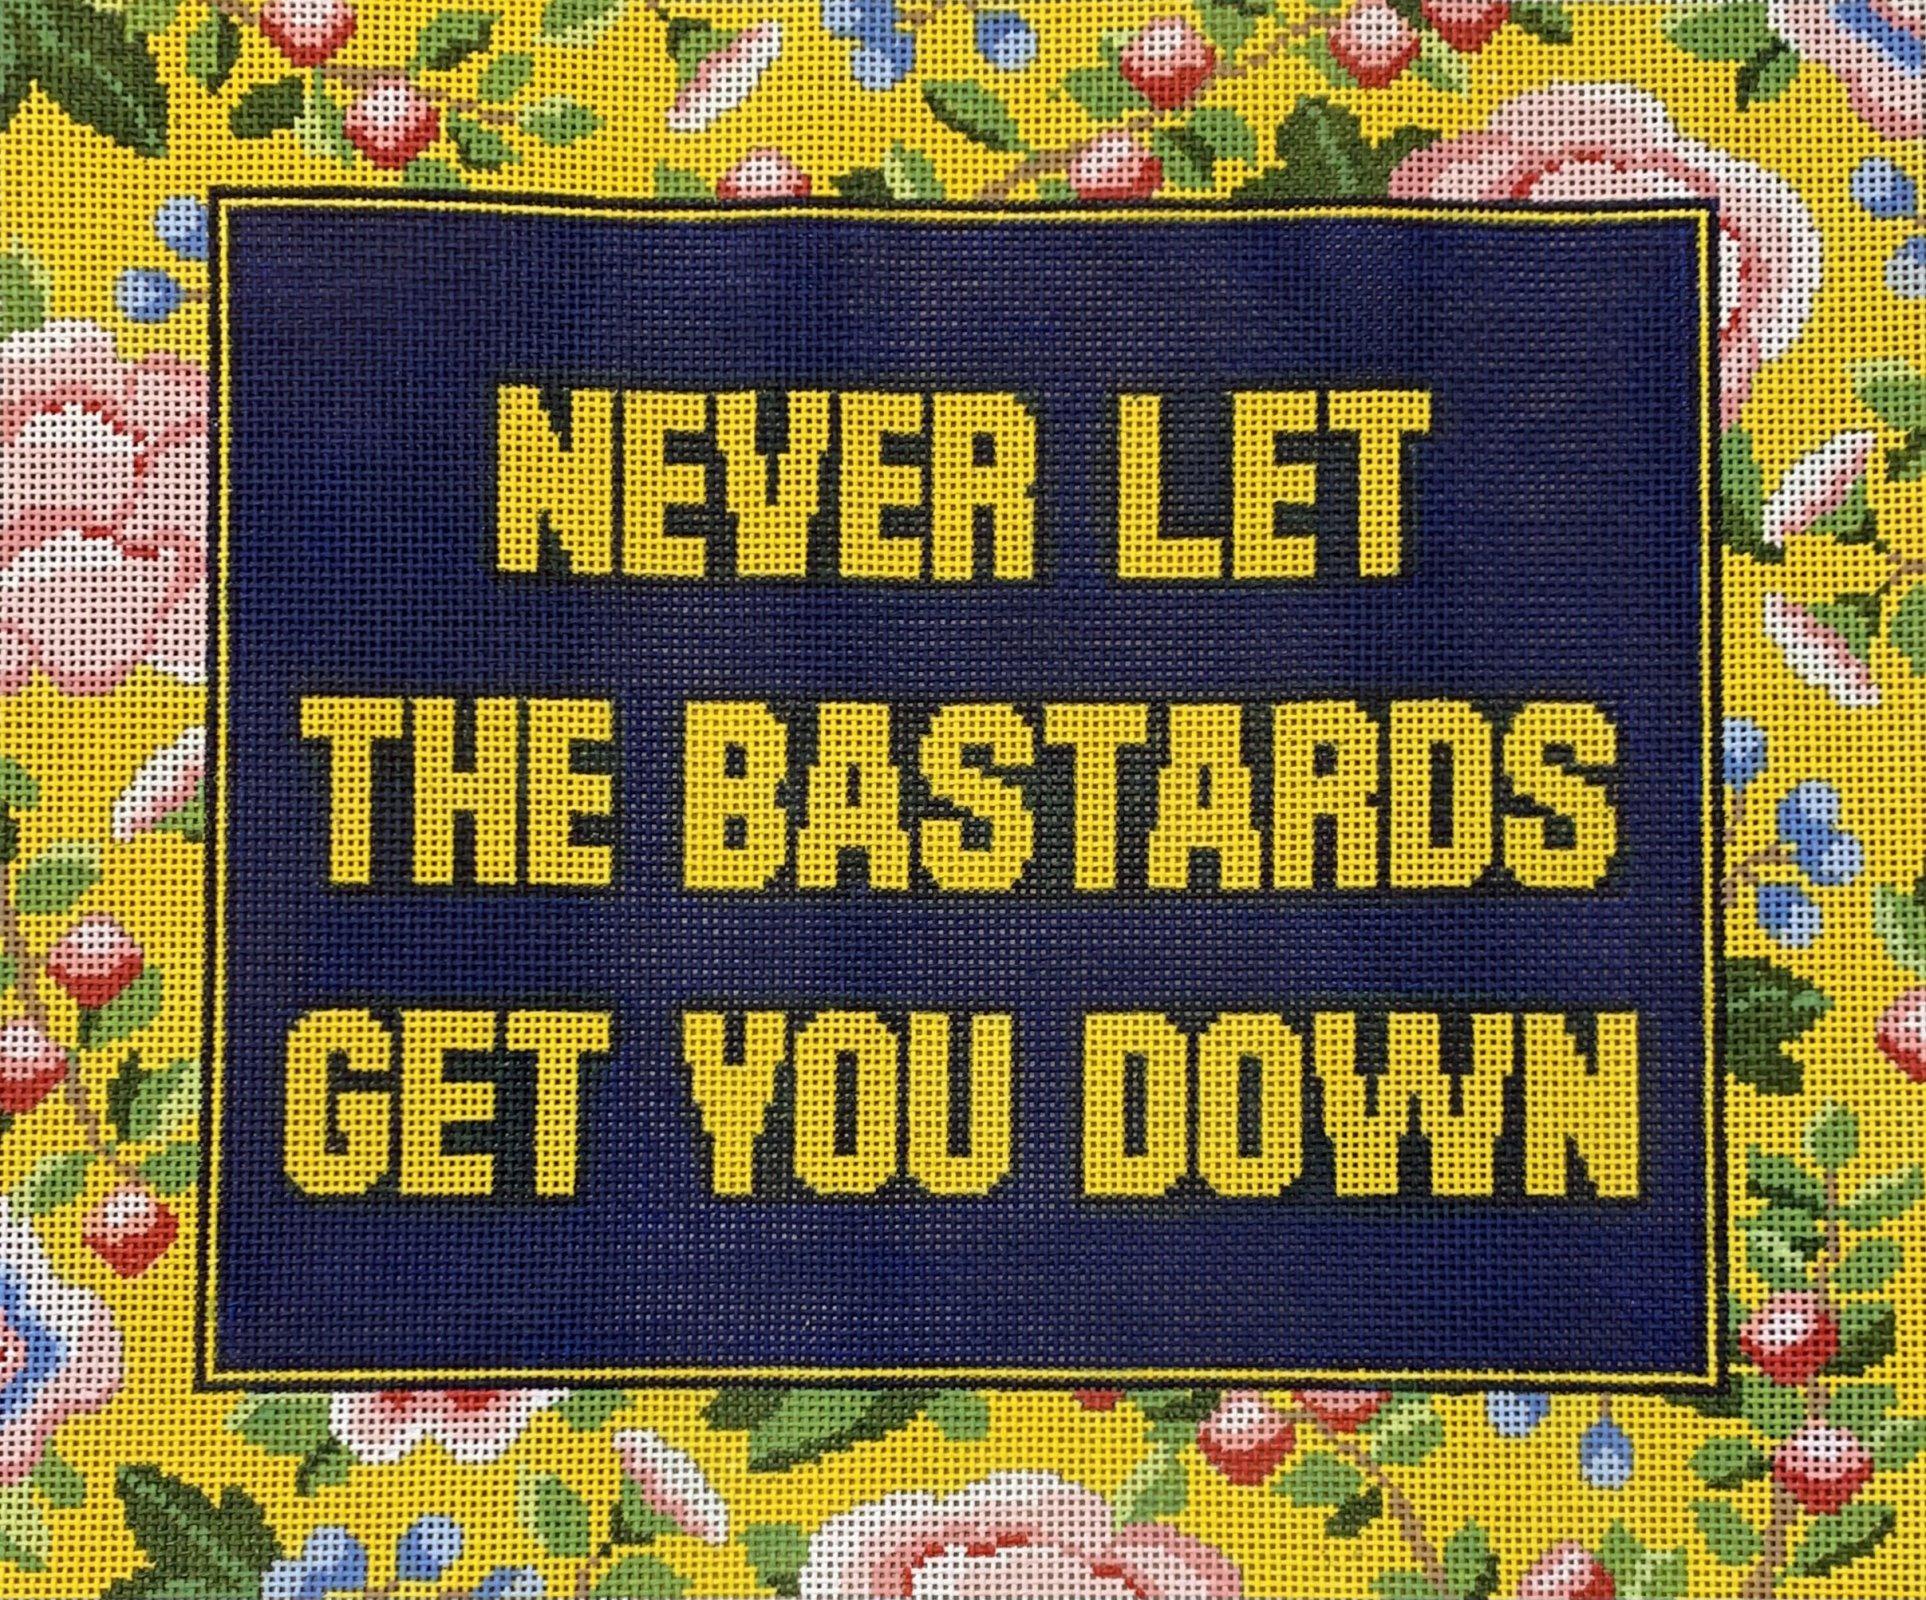 Never Let the Bastards